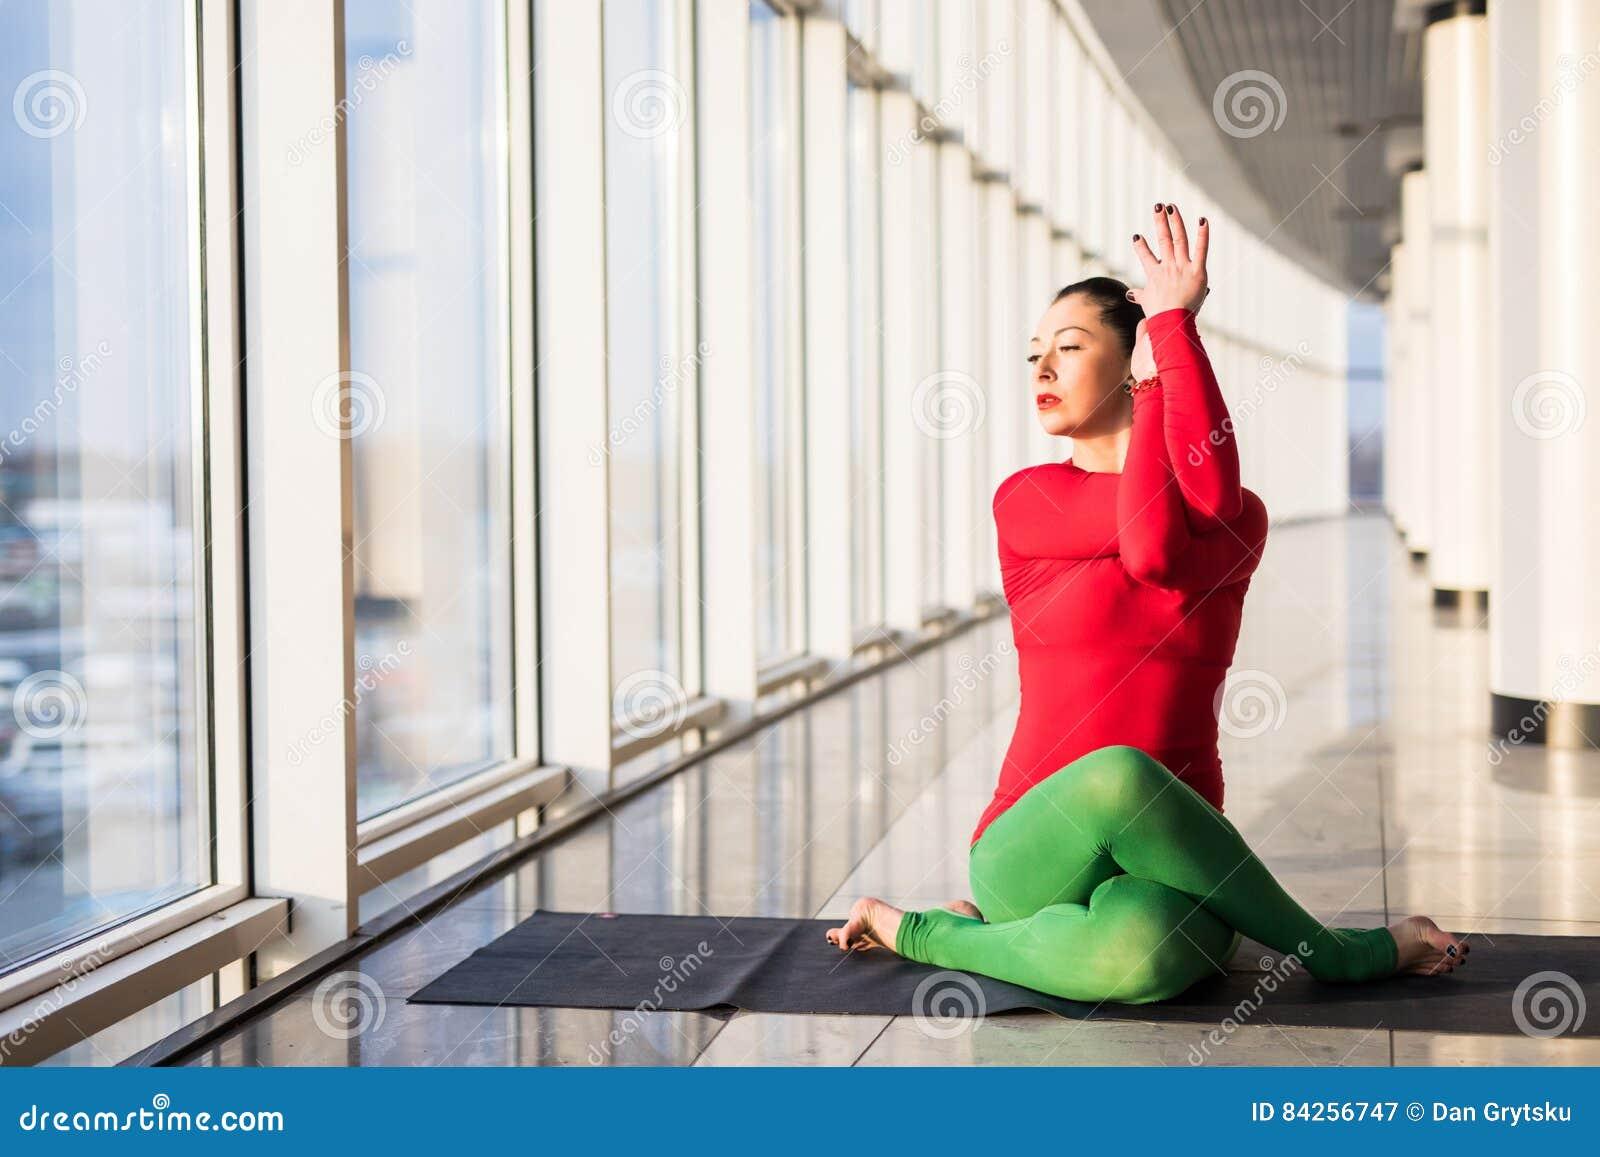 Beautiful yoga woman practice yoga poses on grey background.